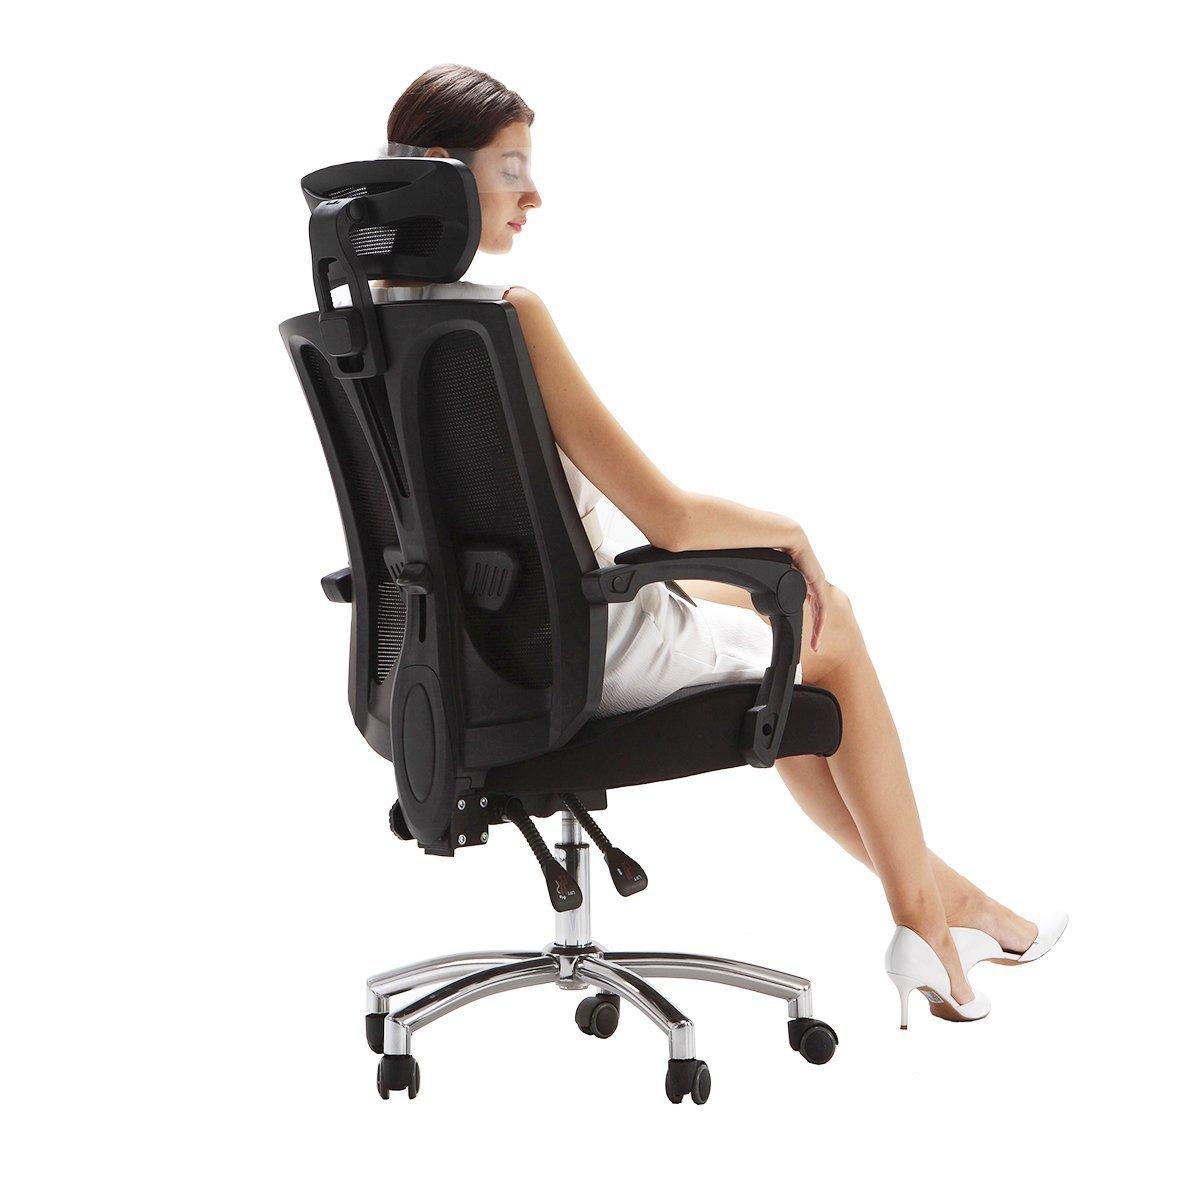 Hbada High-Back Perfect-Fit Office Chair, Ergonomic Chair,Computer Cahir, Desk Chair, Task Chair(Black)